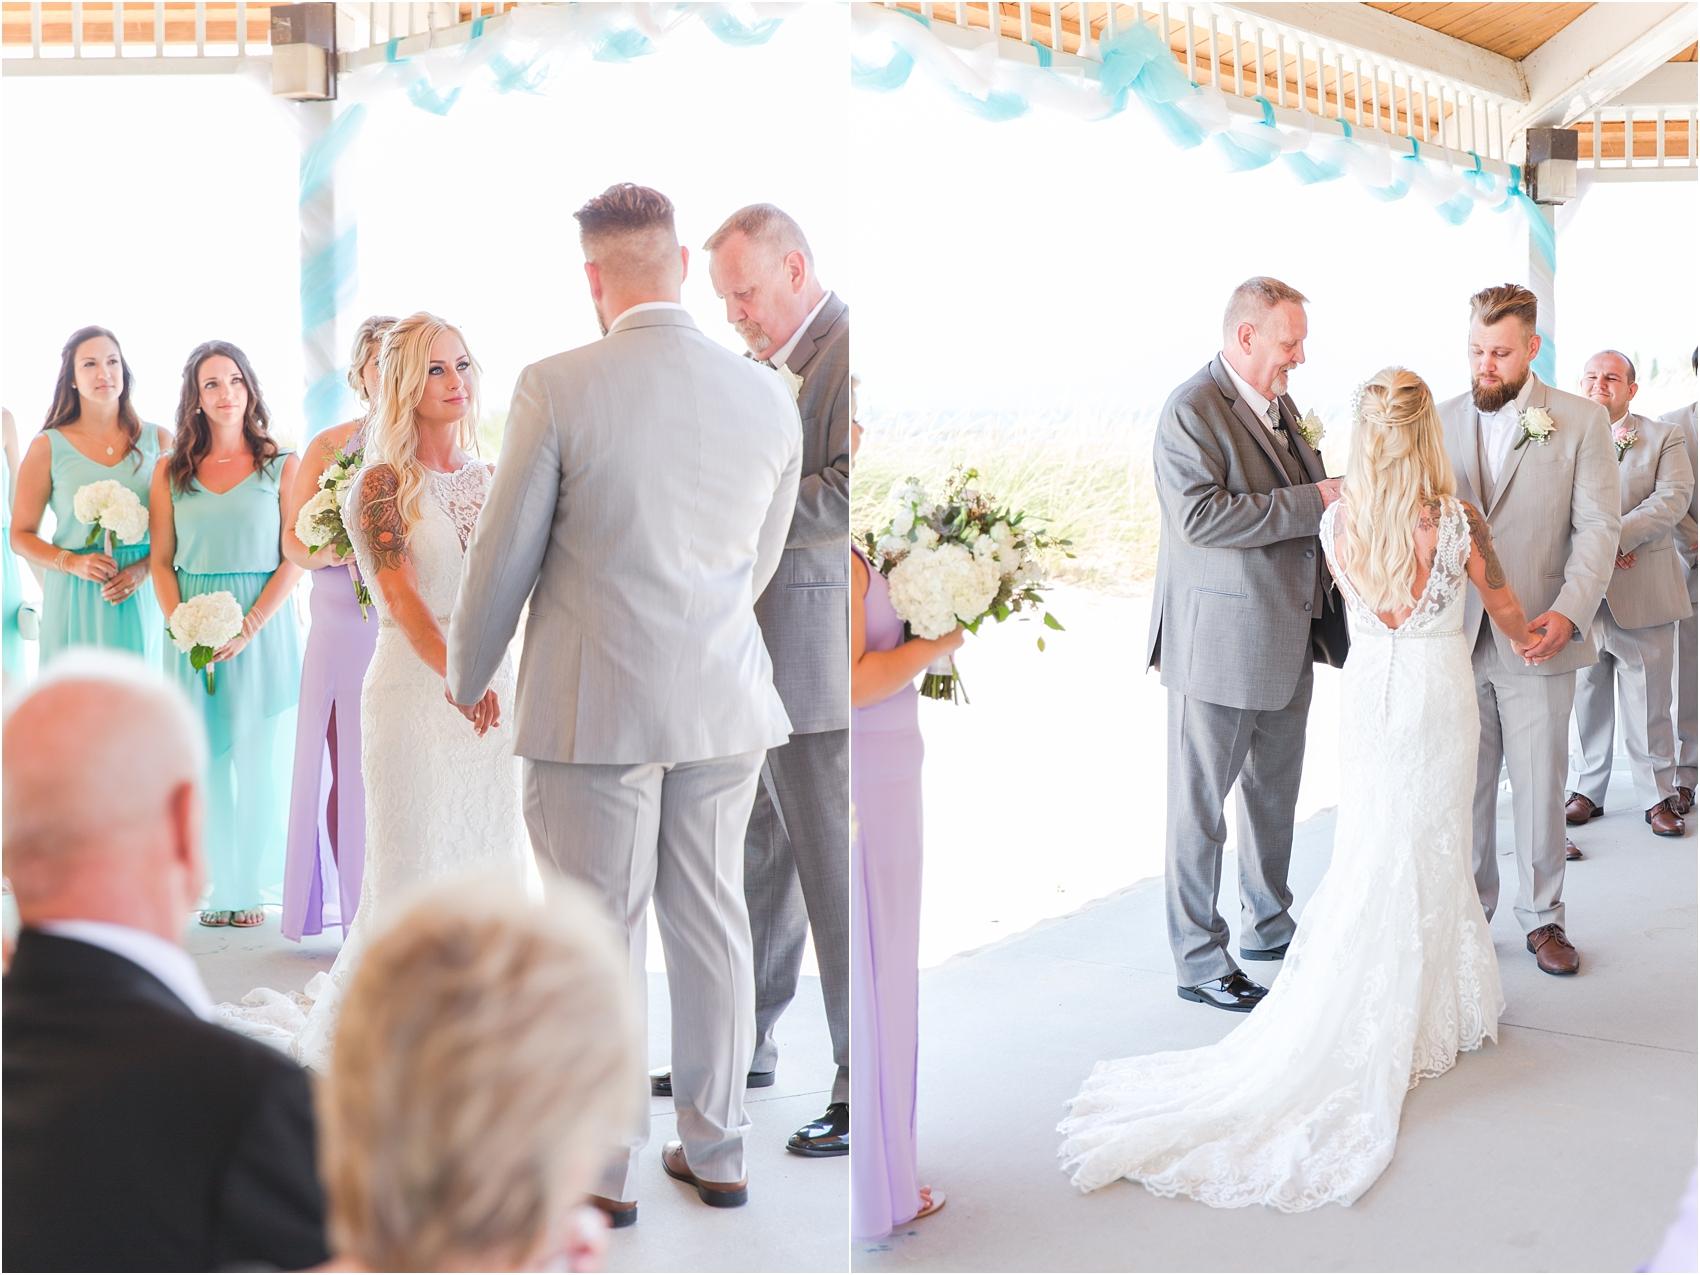 fun-whimsical-beach-wedding-photos-in-st-joseph-michigan-by-courtney-carolyn-photography_0068.jpg